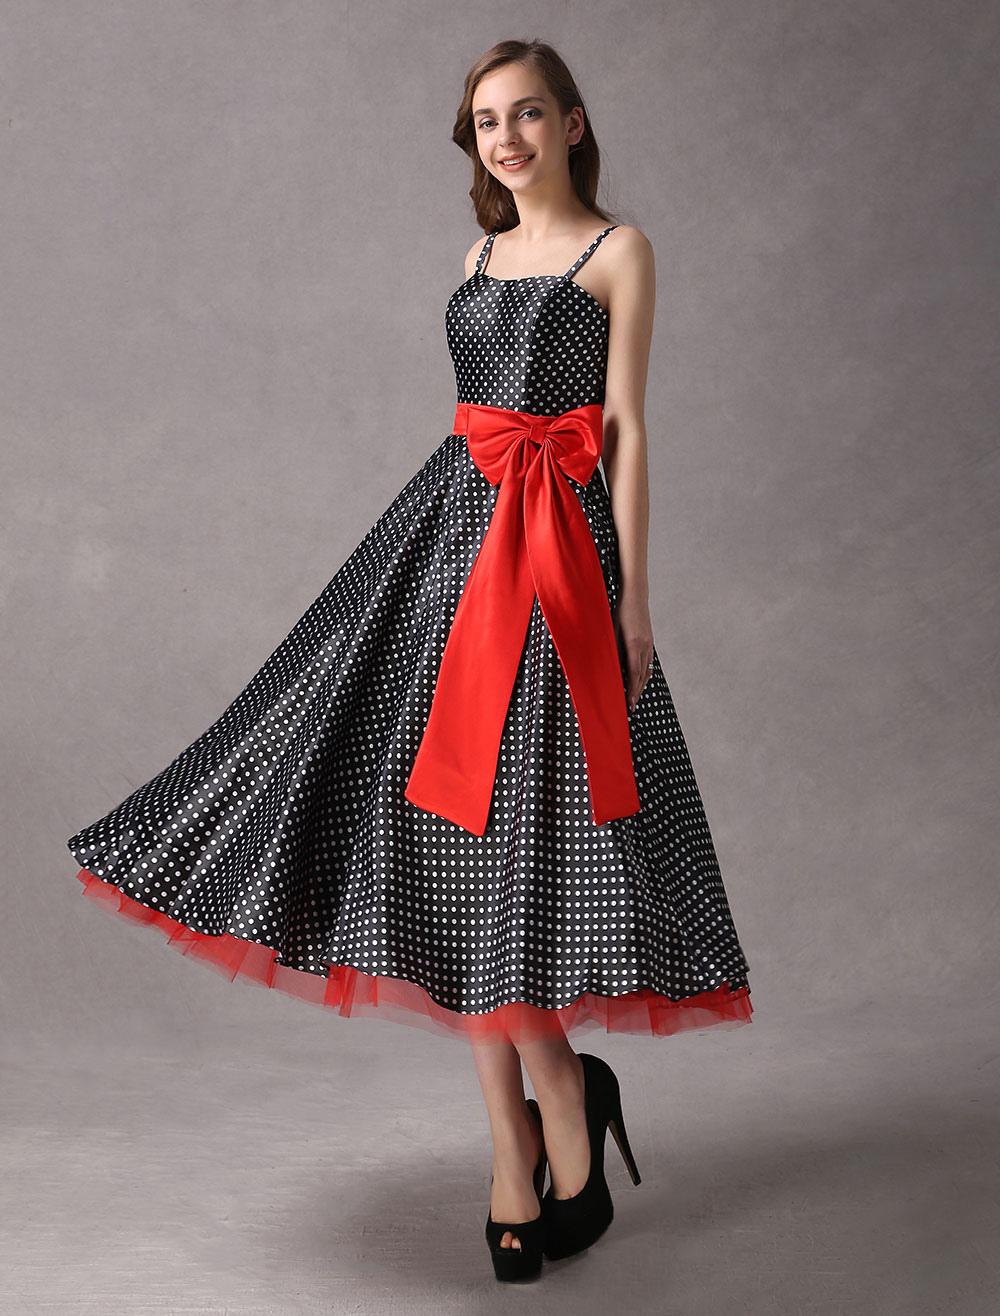 Rockabilly Bridesmaid Dresses Black Polka Dot Printed Vintage Ribbon Bow Sash Straps Tea Length Wedding Party Dress